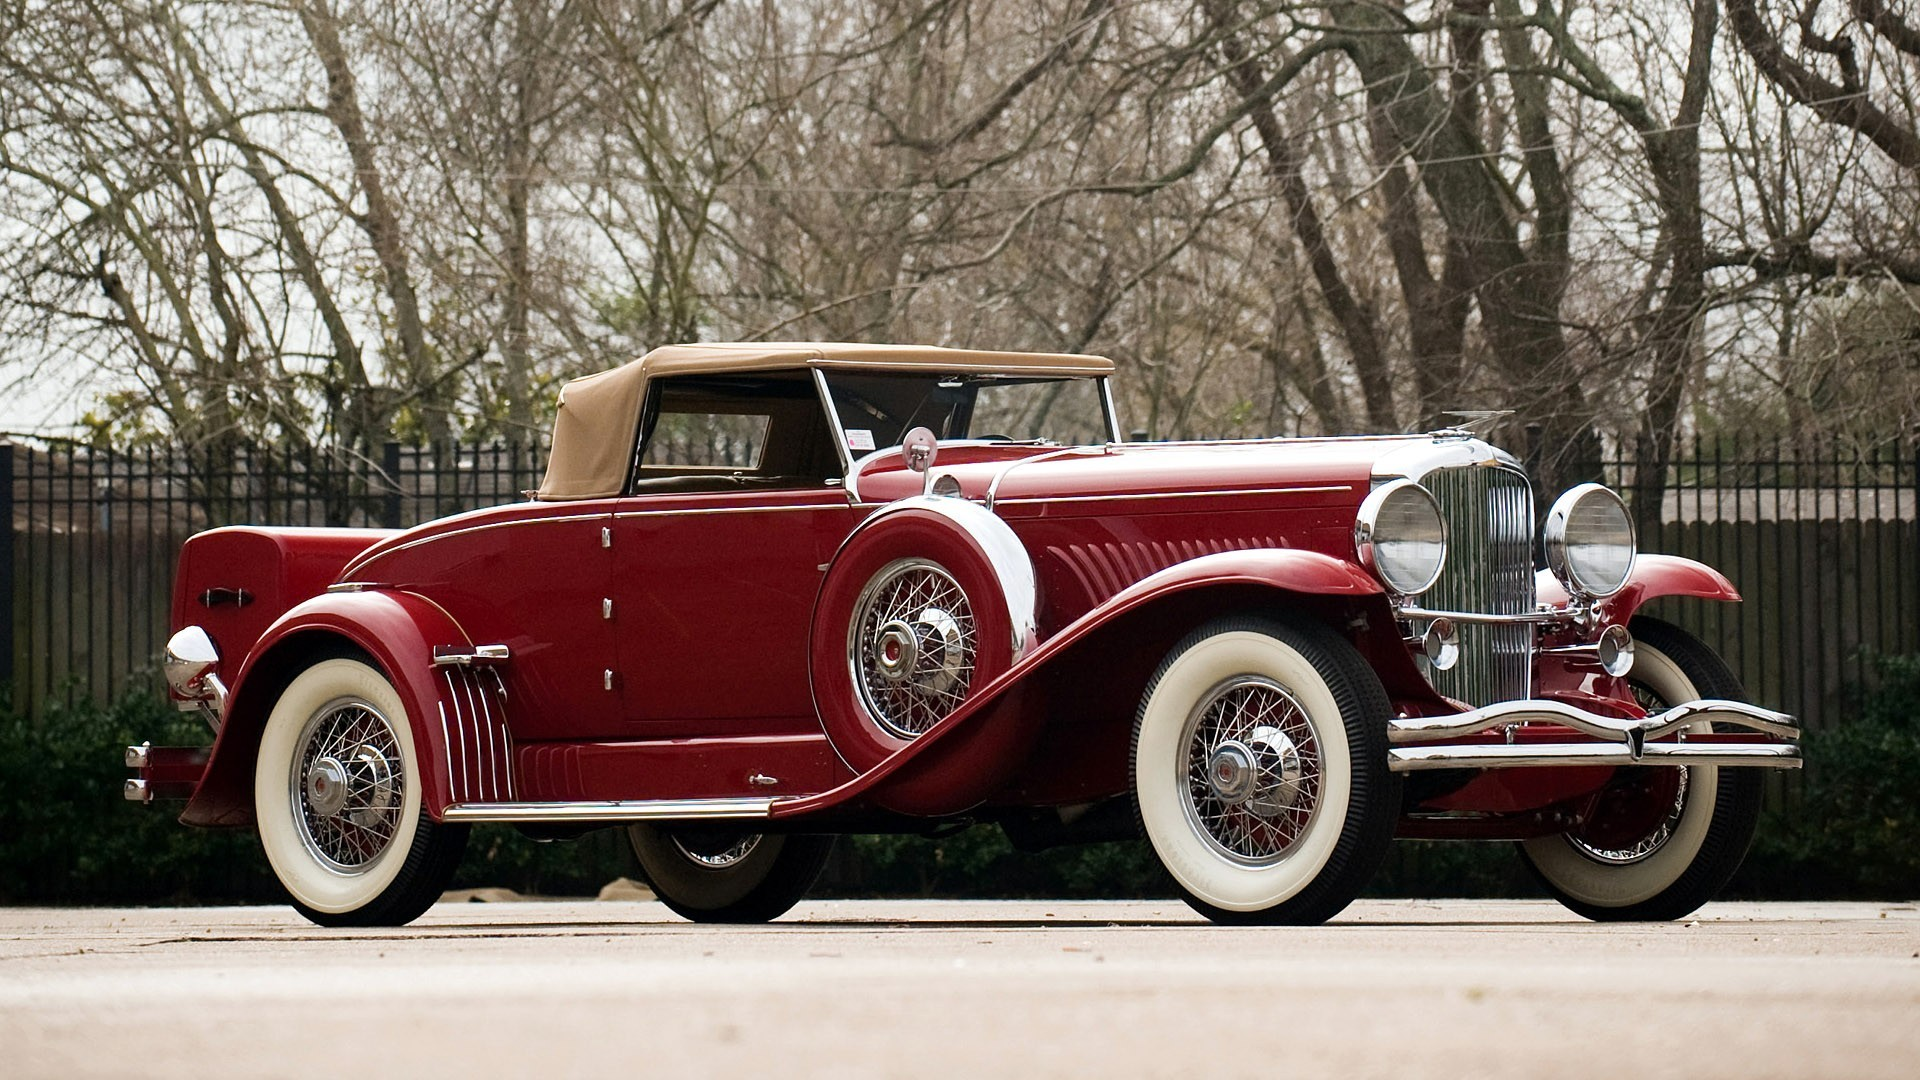 Res: 1920x1080, Vintage Cars Wallpaper  Vintage, Cars, Classic, Cars